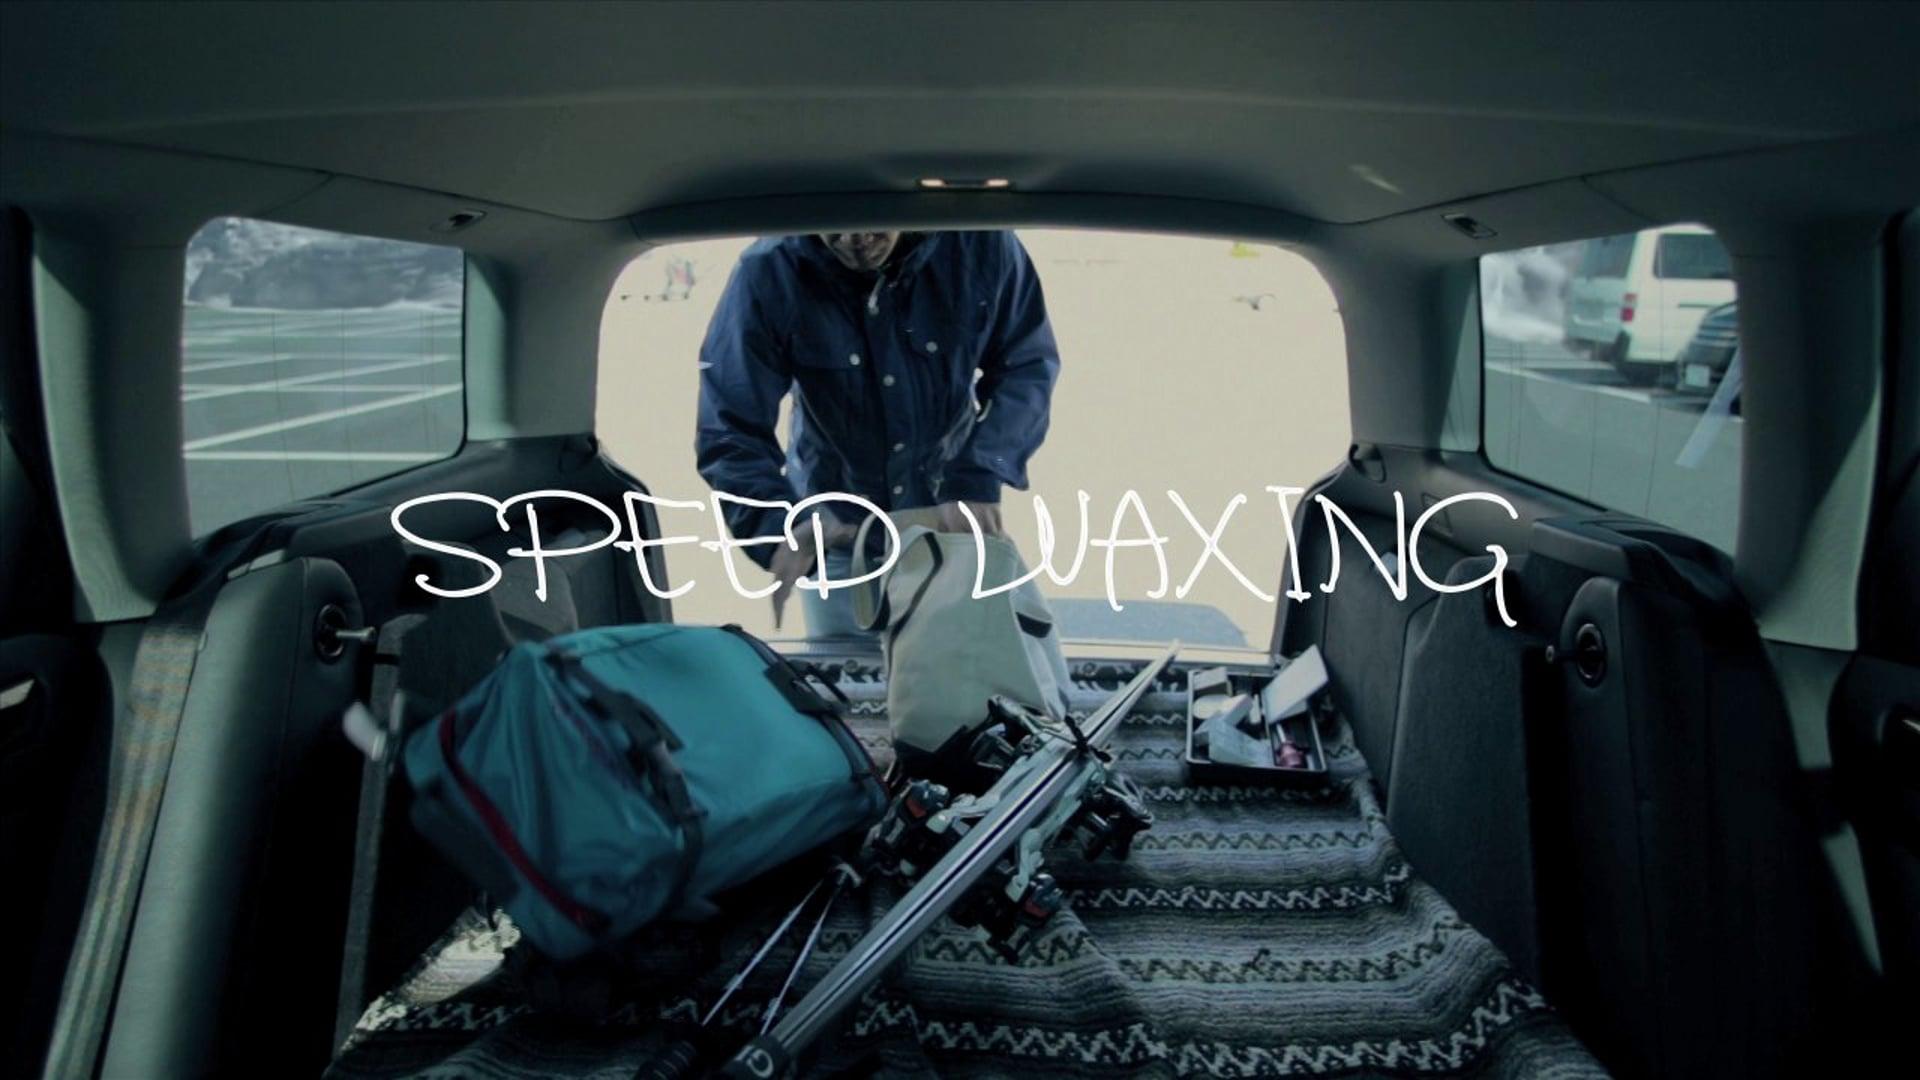 【HIKE】SPEED WAXING